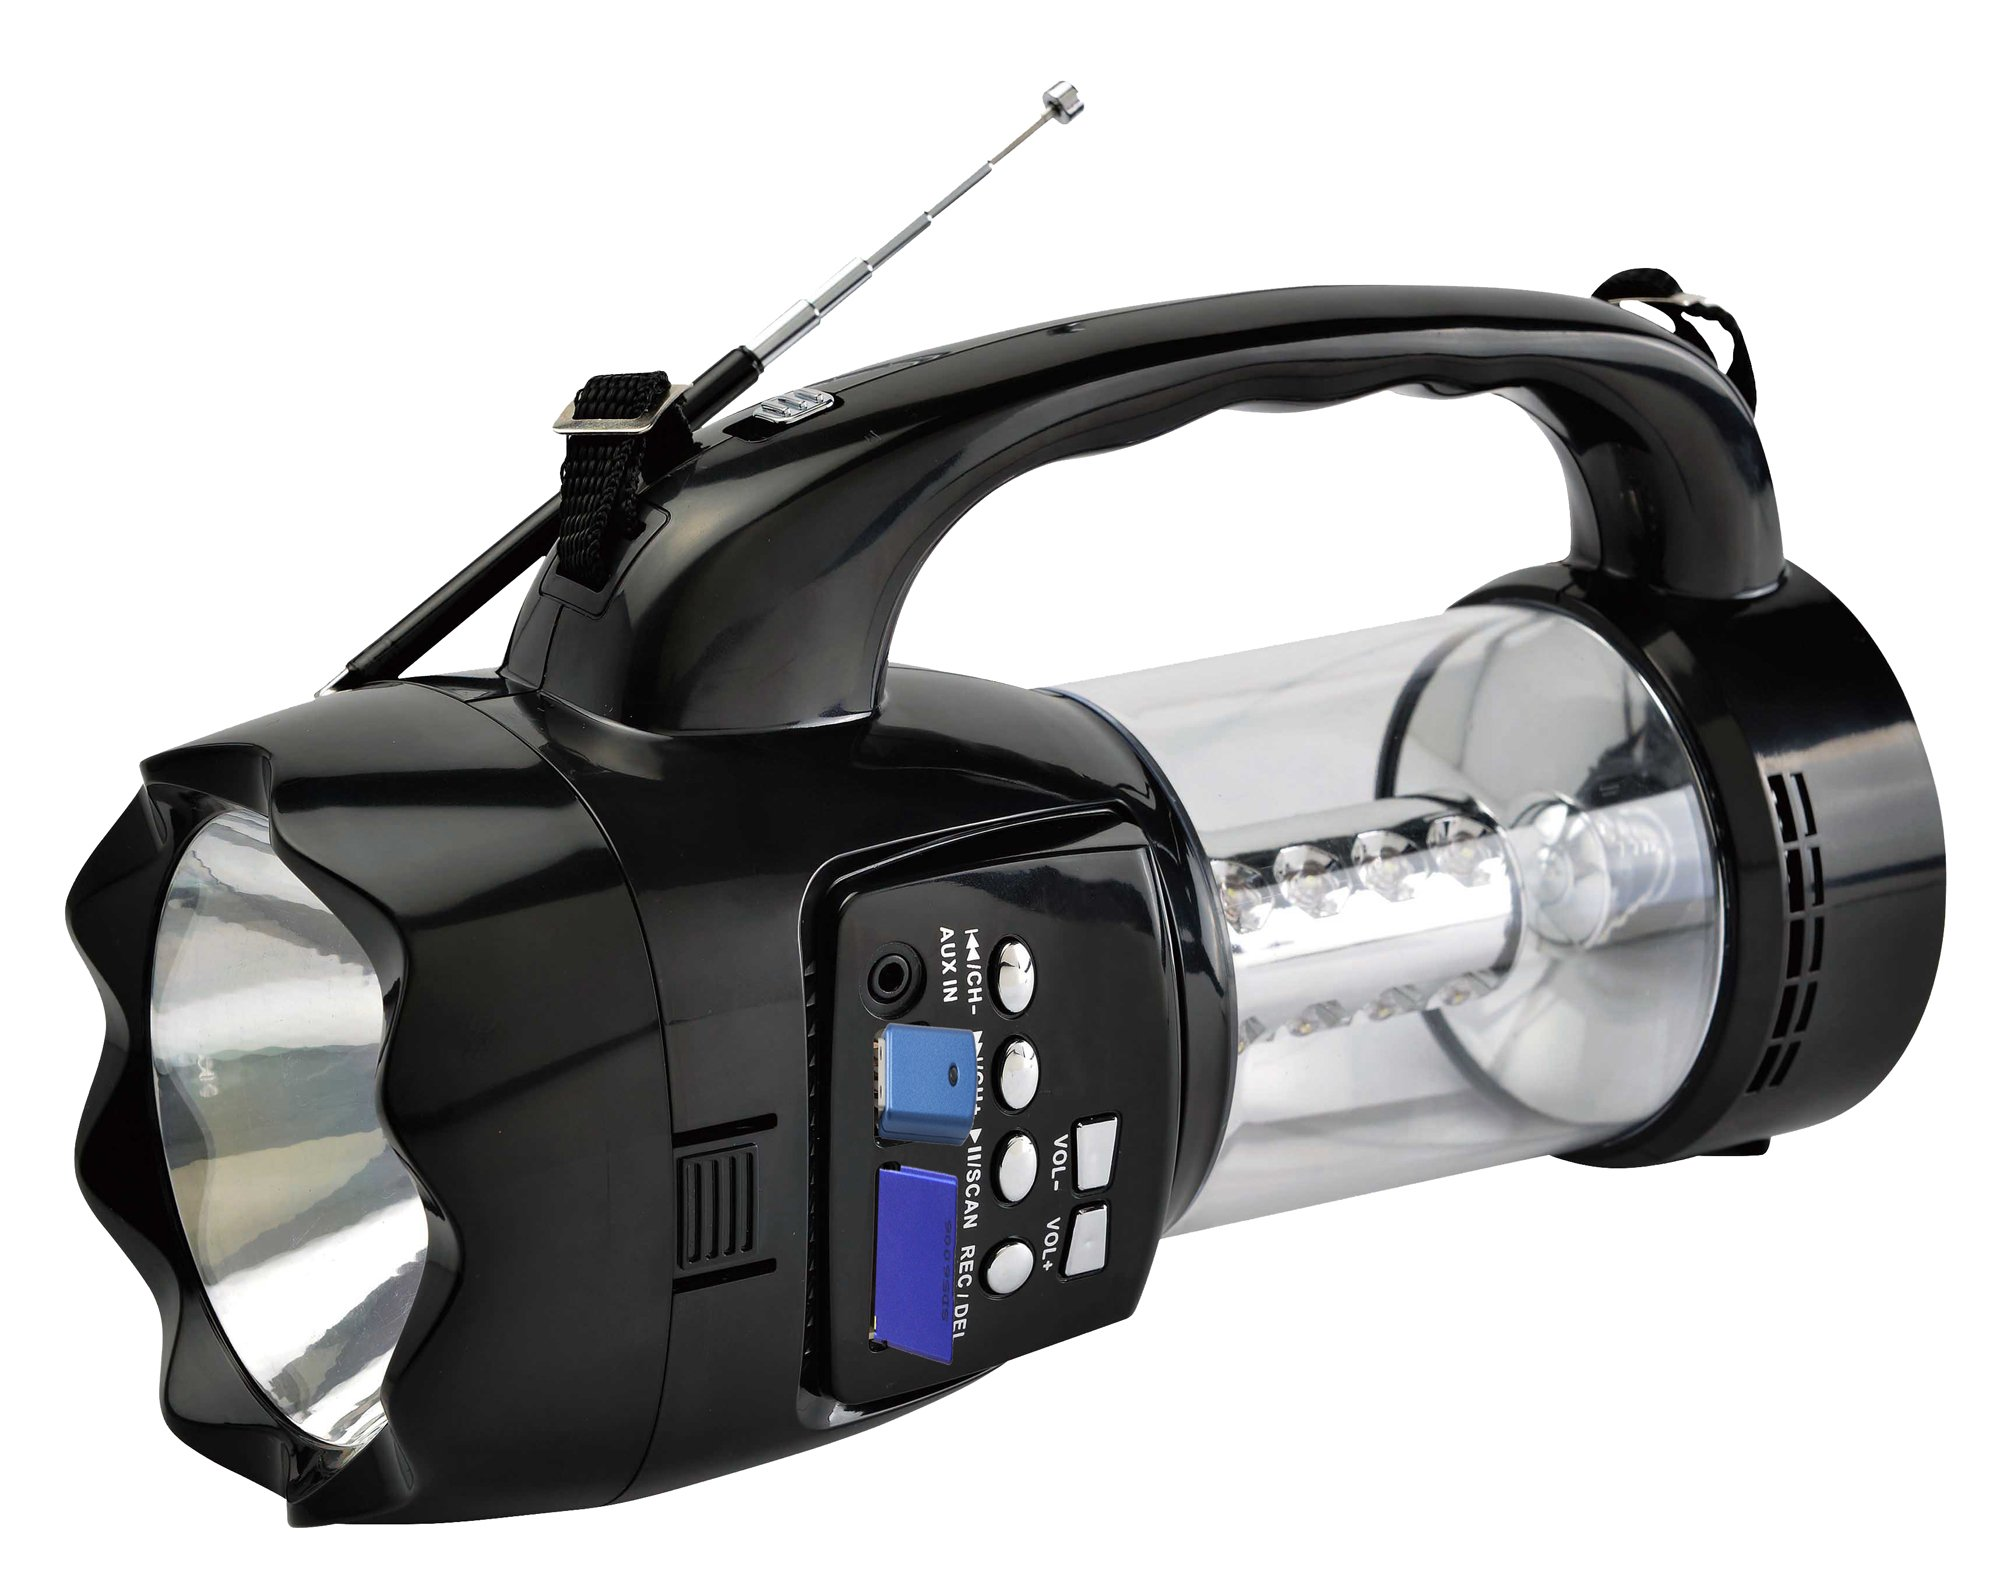 QFX Hangable; Portable Novelty Radio Black (R-180)